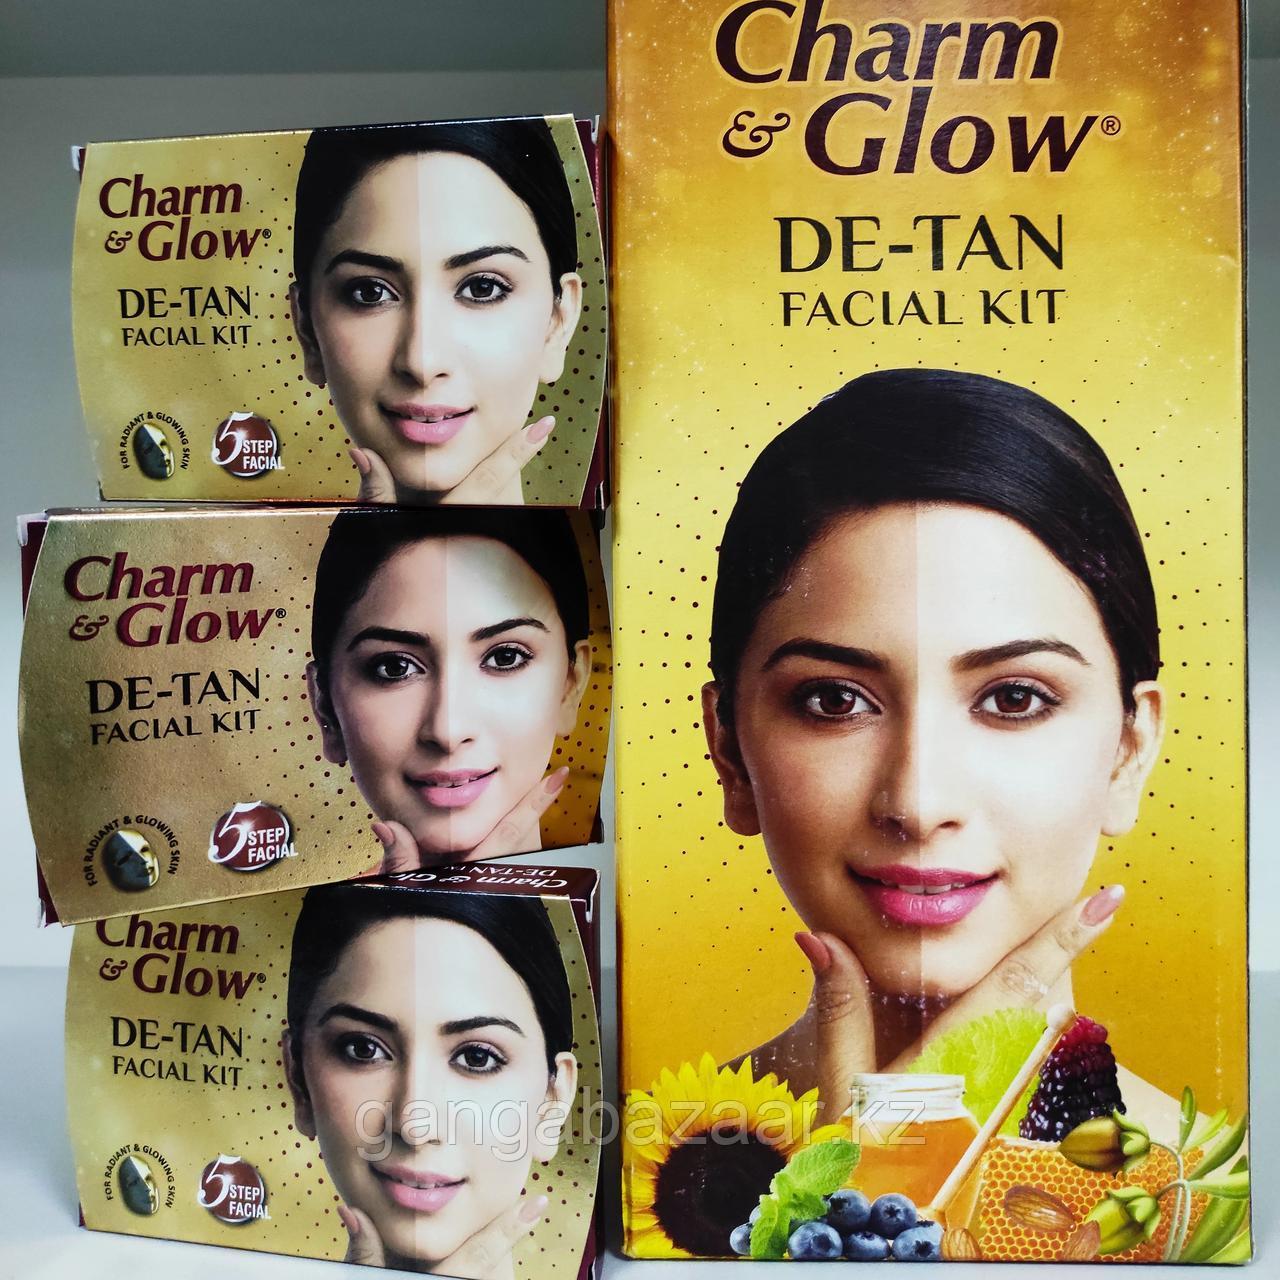 Чарм энд Глоу ДиТэн/ Charm&Glow De-Tan - антивозрастная 5-ступенчатая система ухода за кожей лица